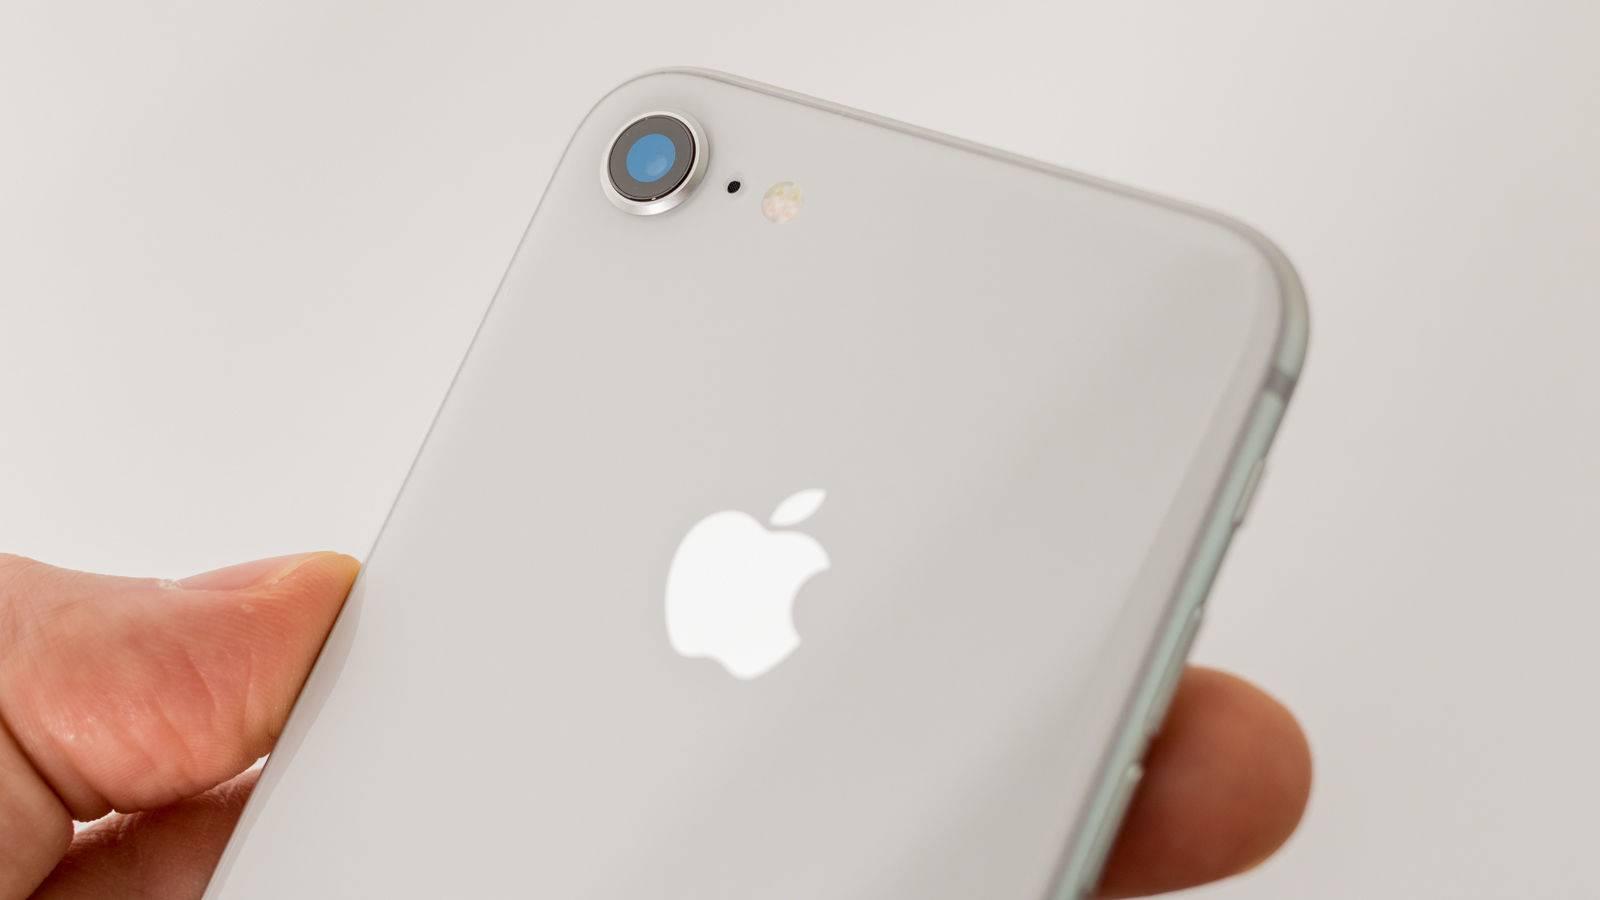 iPhone SE 2 arata iphone 8 specificatii lansare